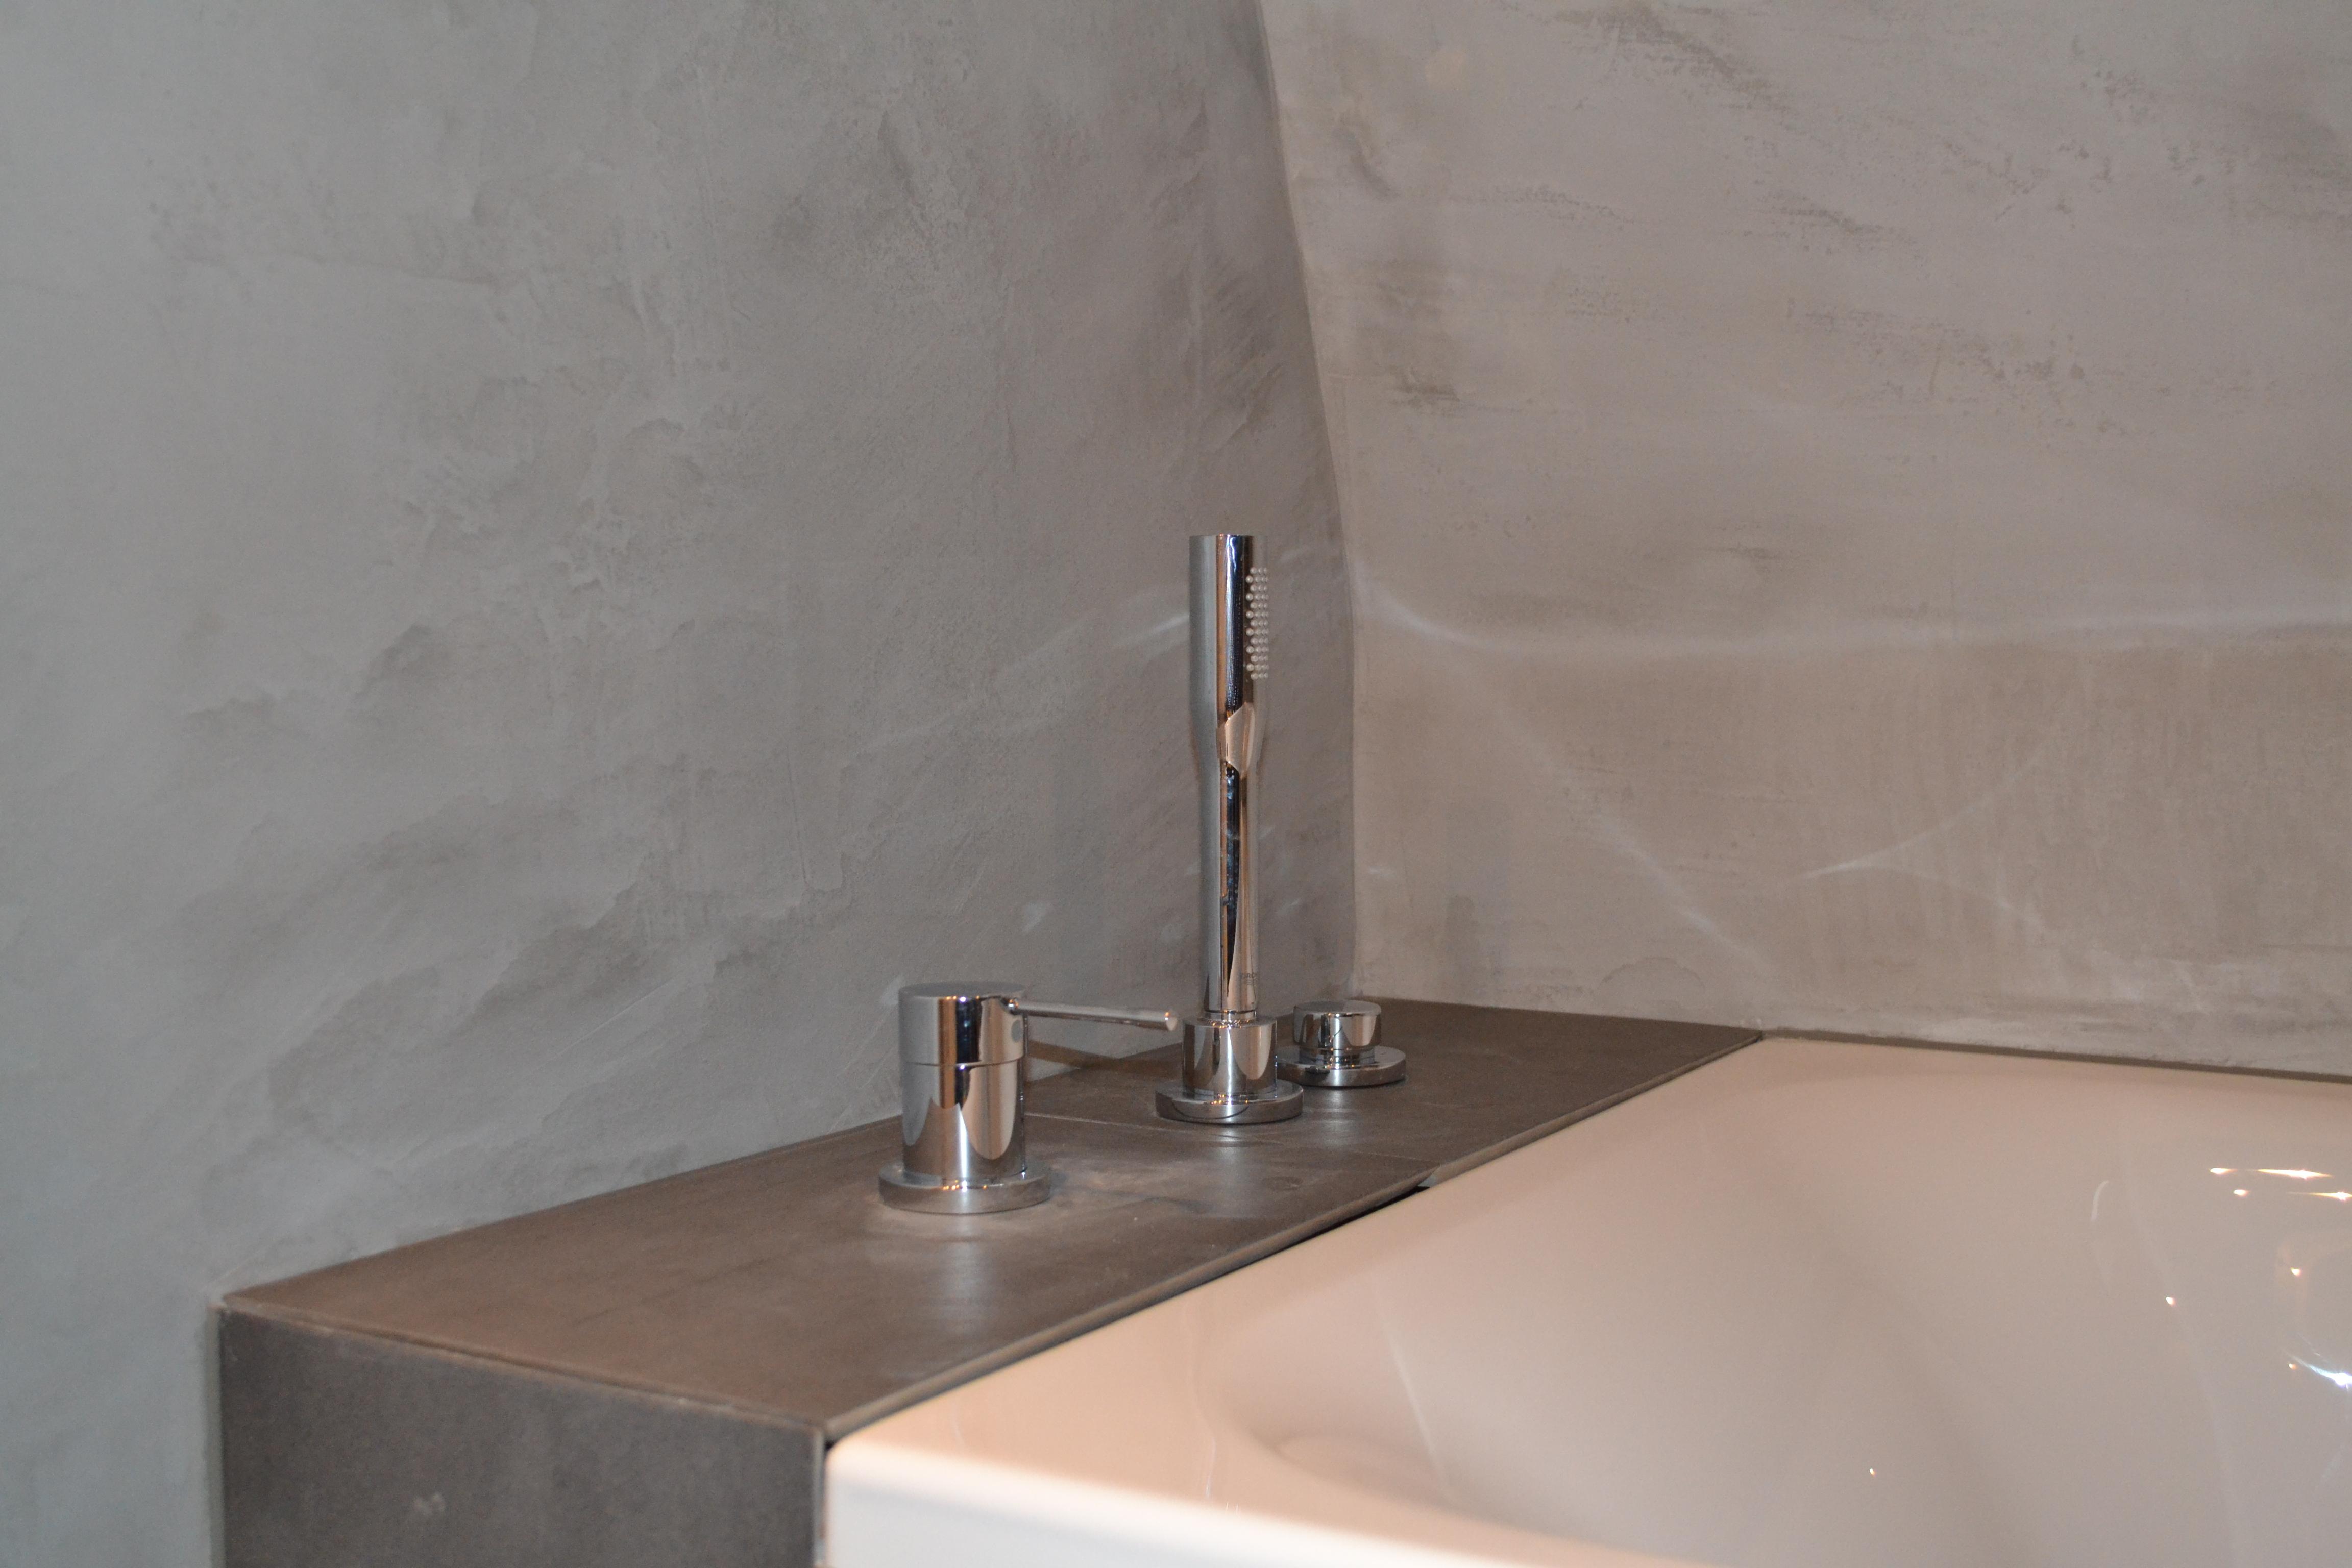 Sanitair loodgieter j prent b v - Badkamer jaar ...